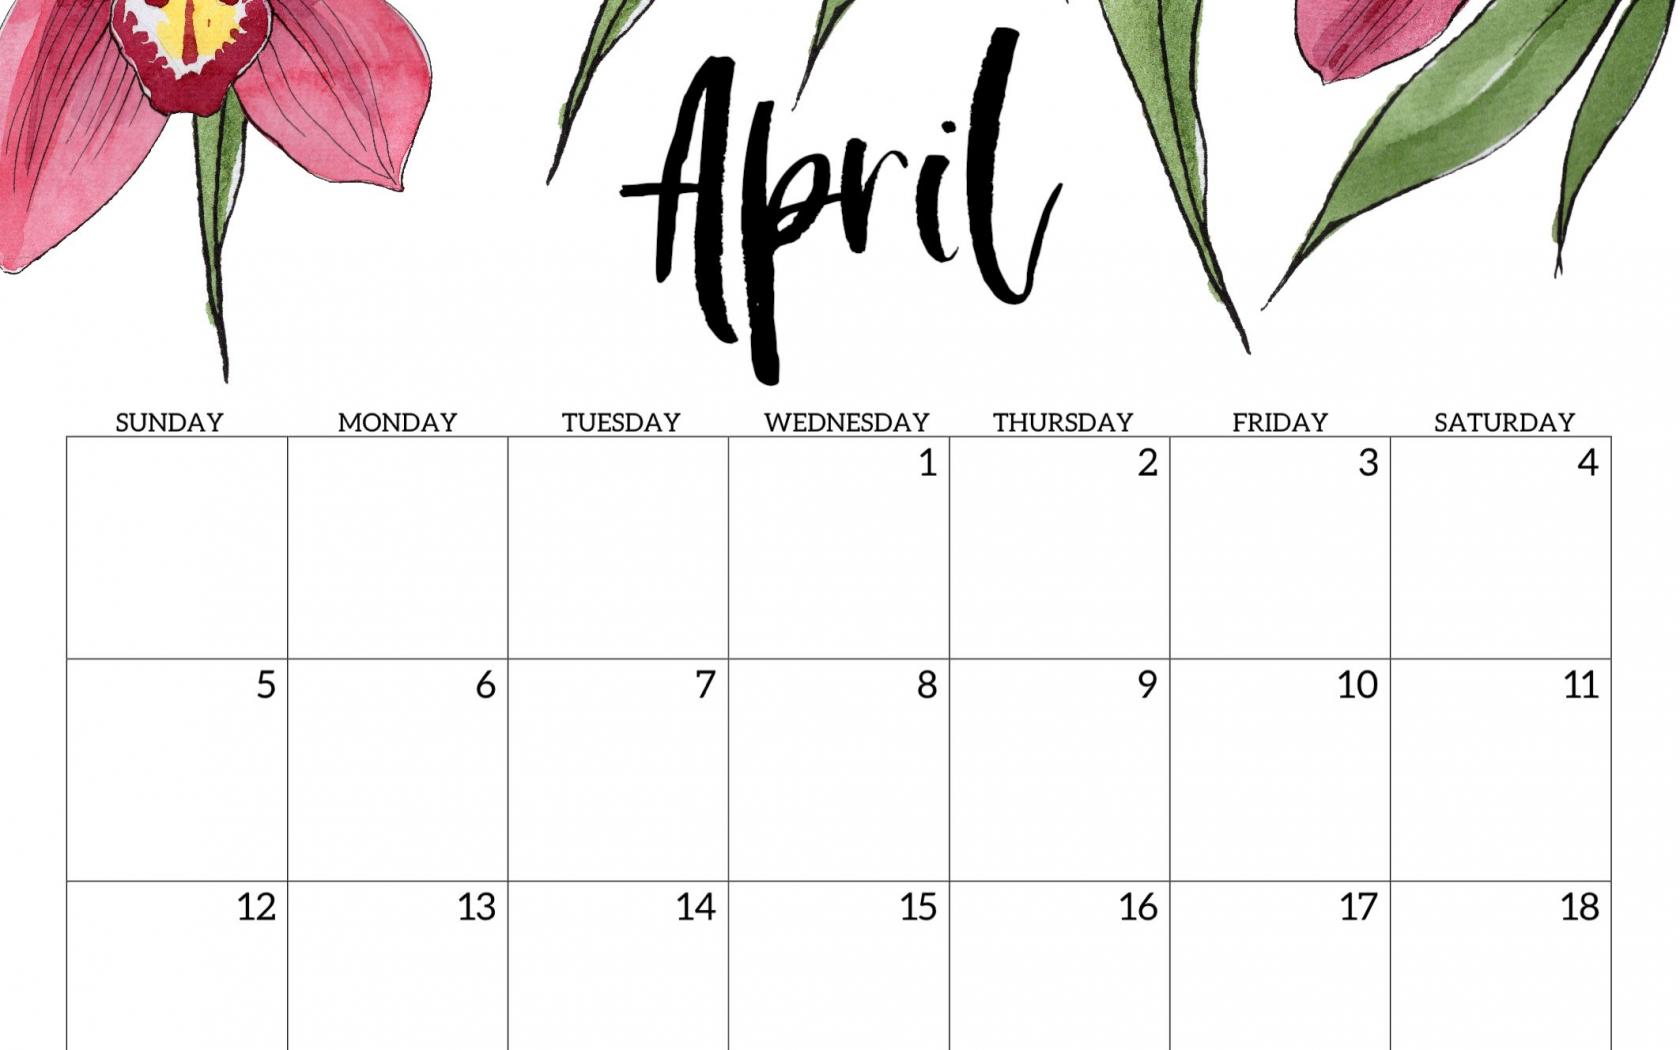 free download april 2020 calendar wallpapers top april